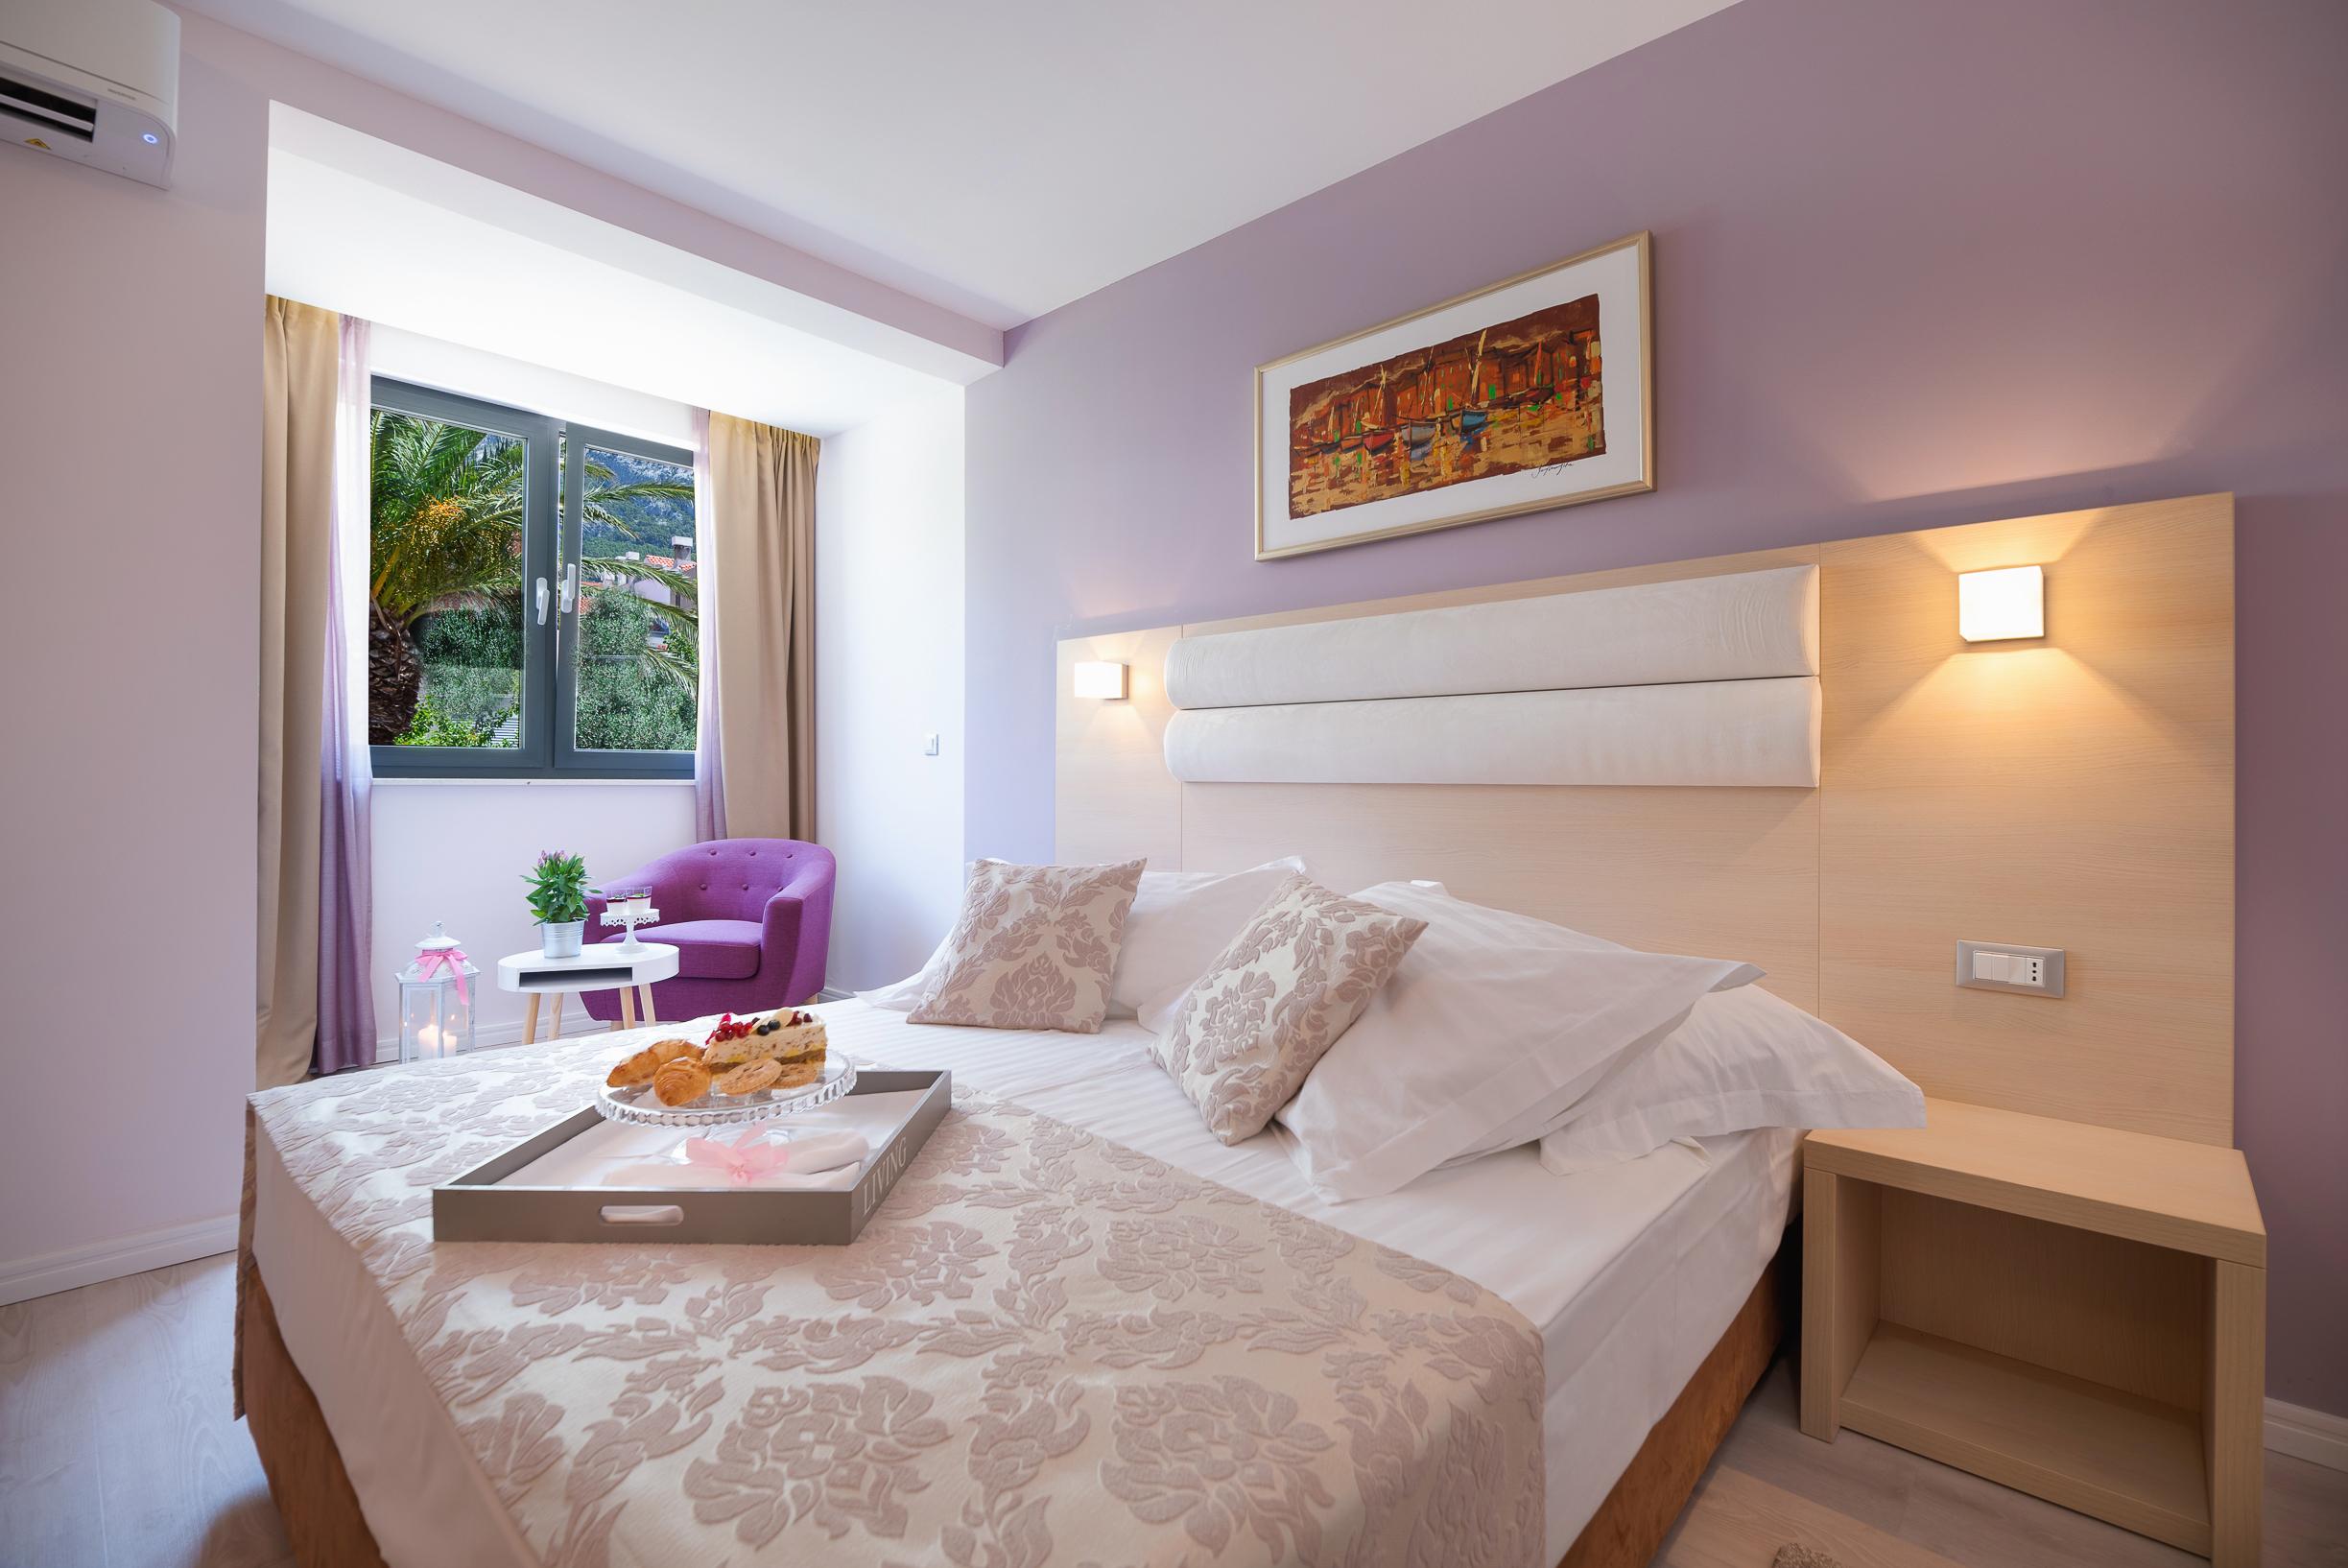 Hotel-Maritimo-Soba-5-1-of-21